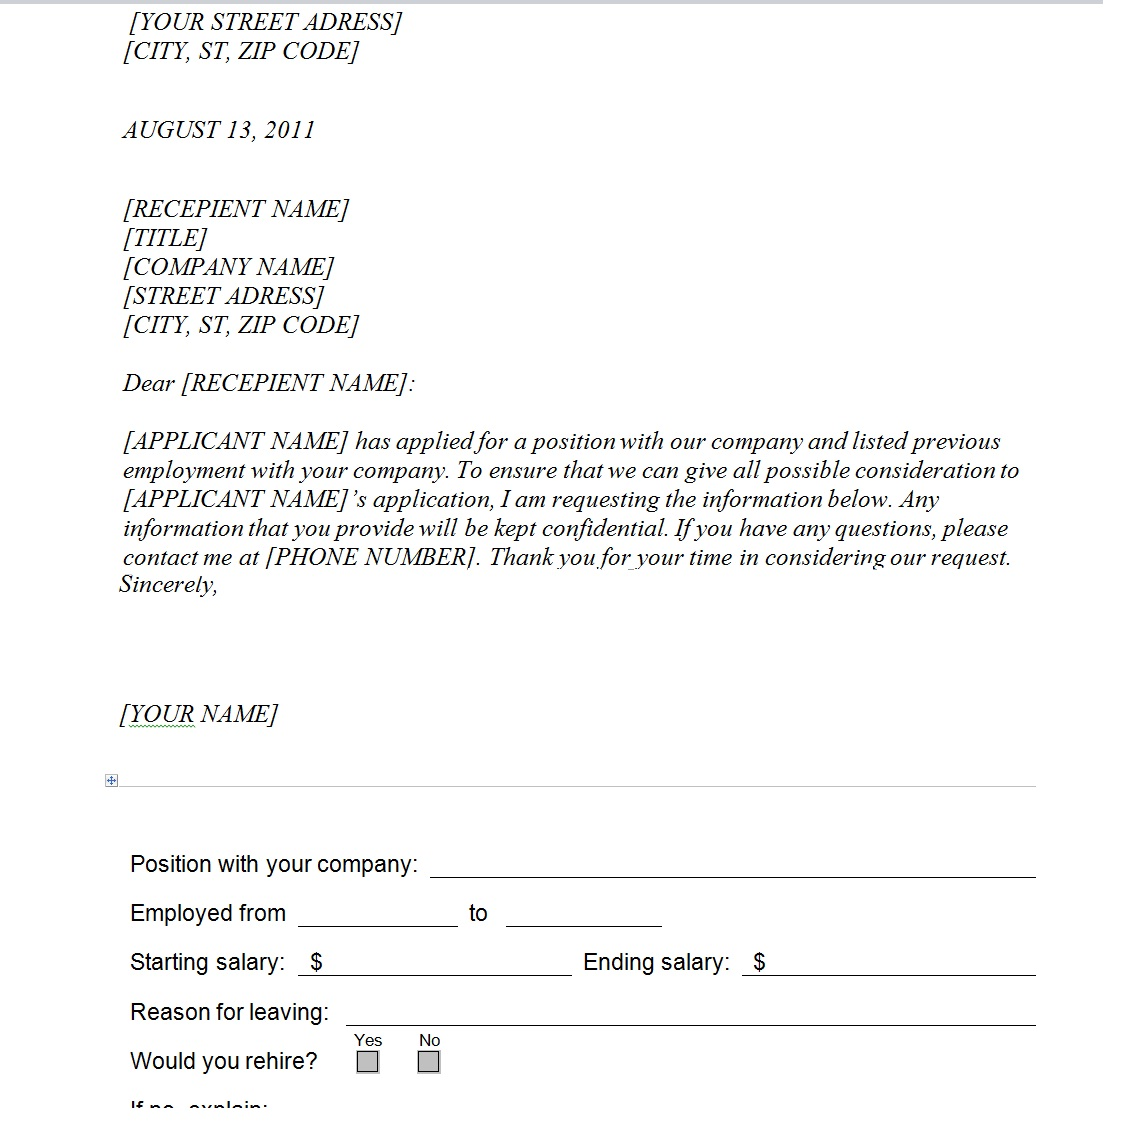 Previous Employment Verification Request Template Sample